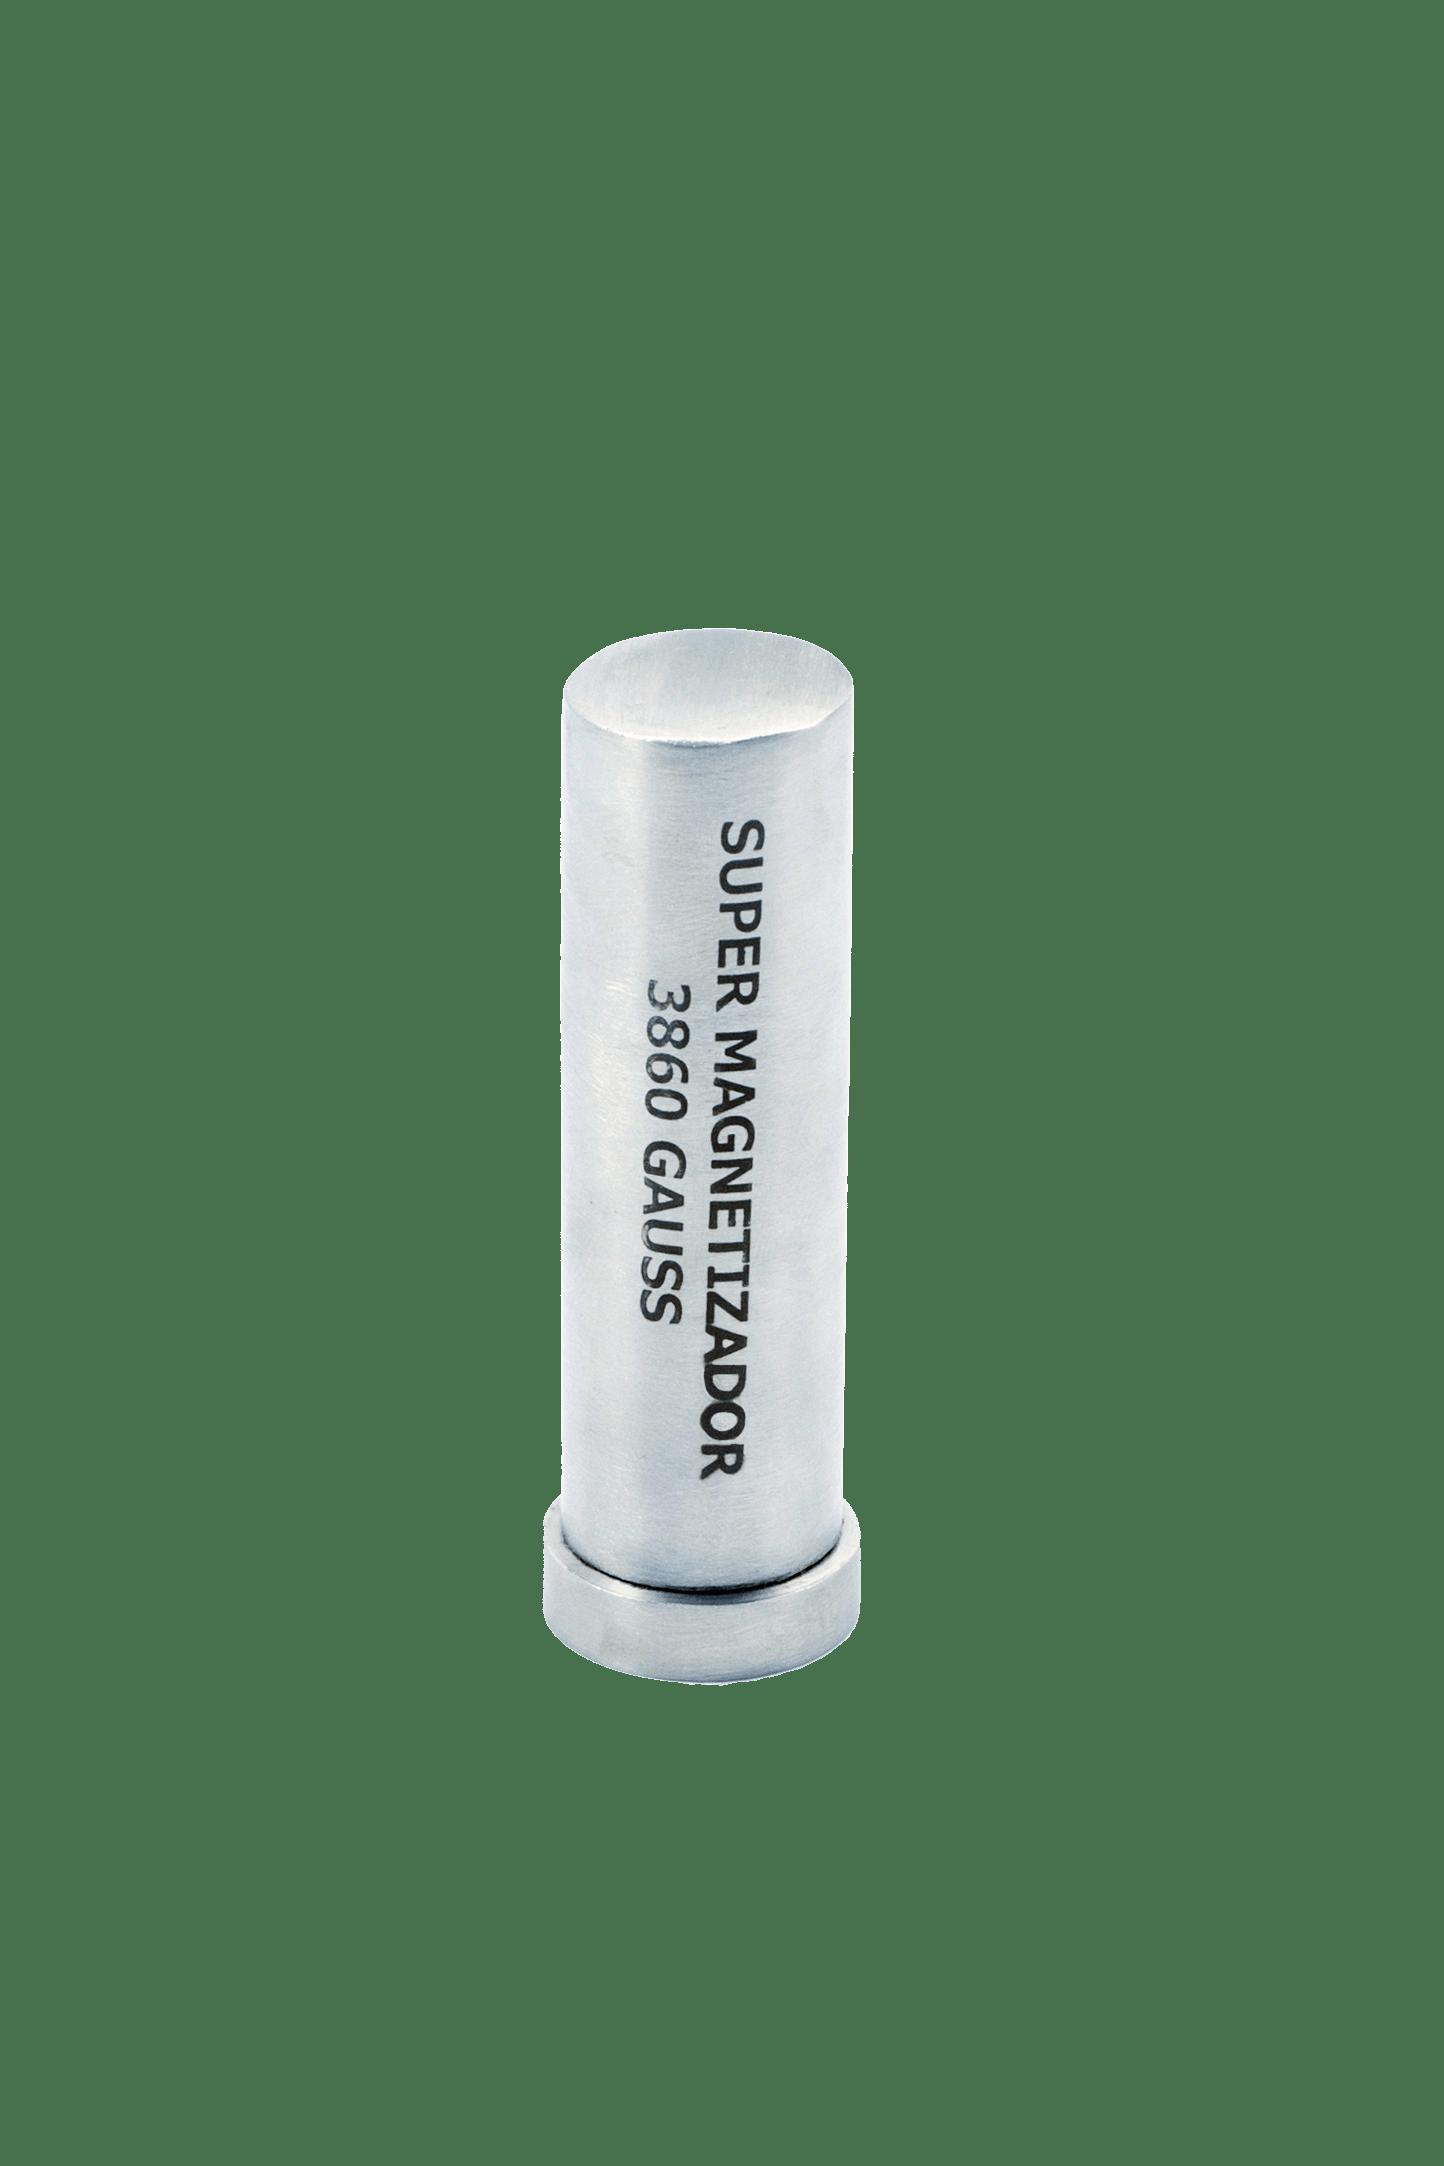 Magnetizador Portatil